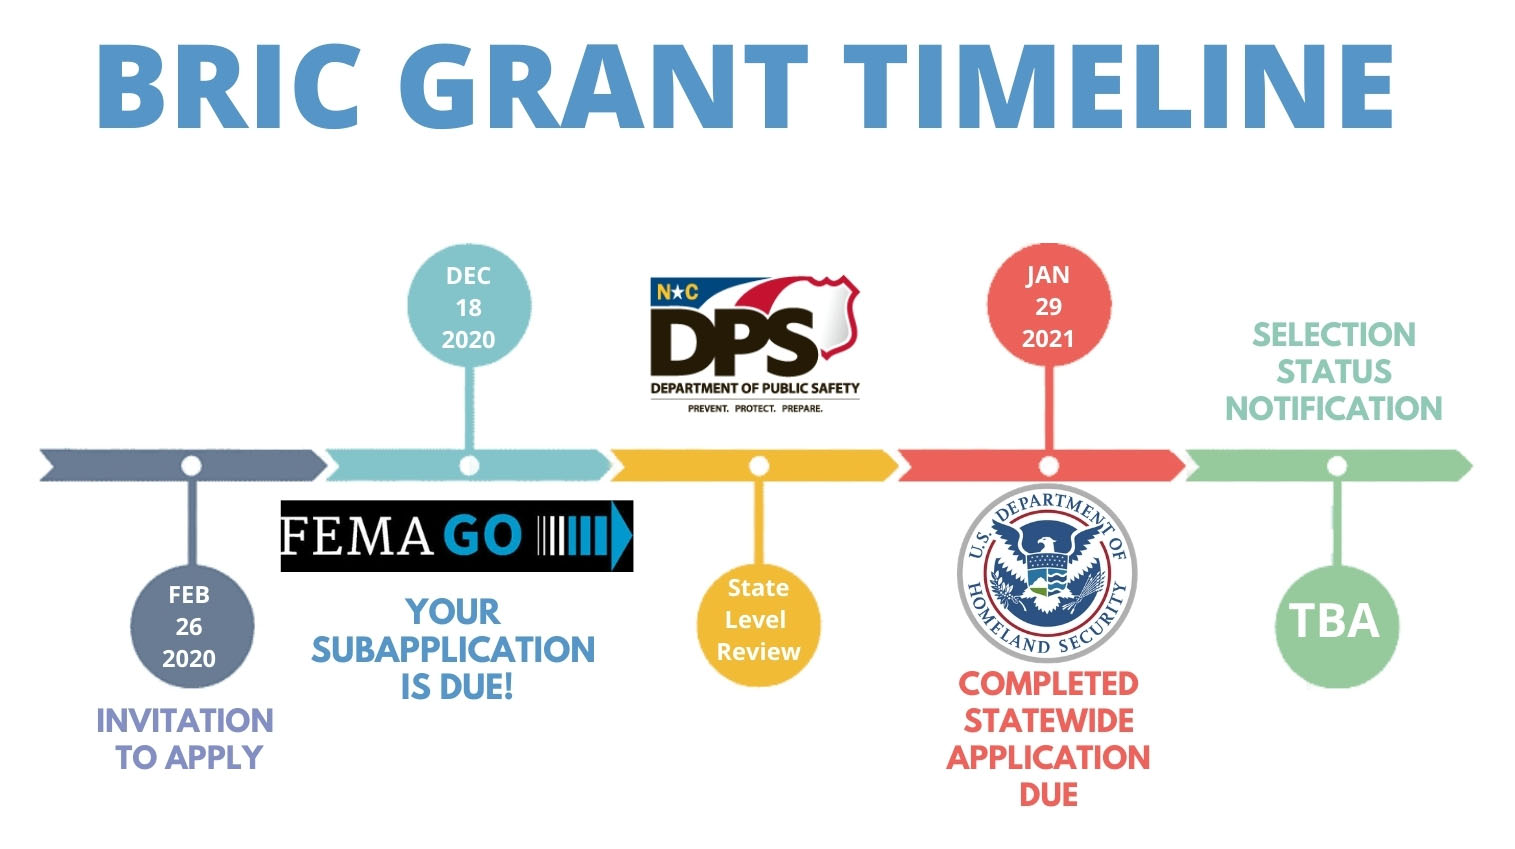 BRIC grant timeline